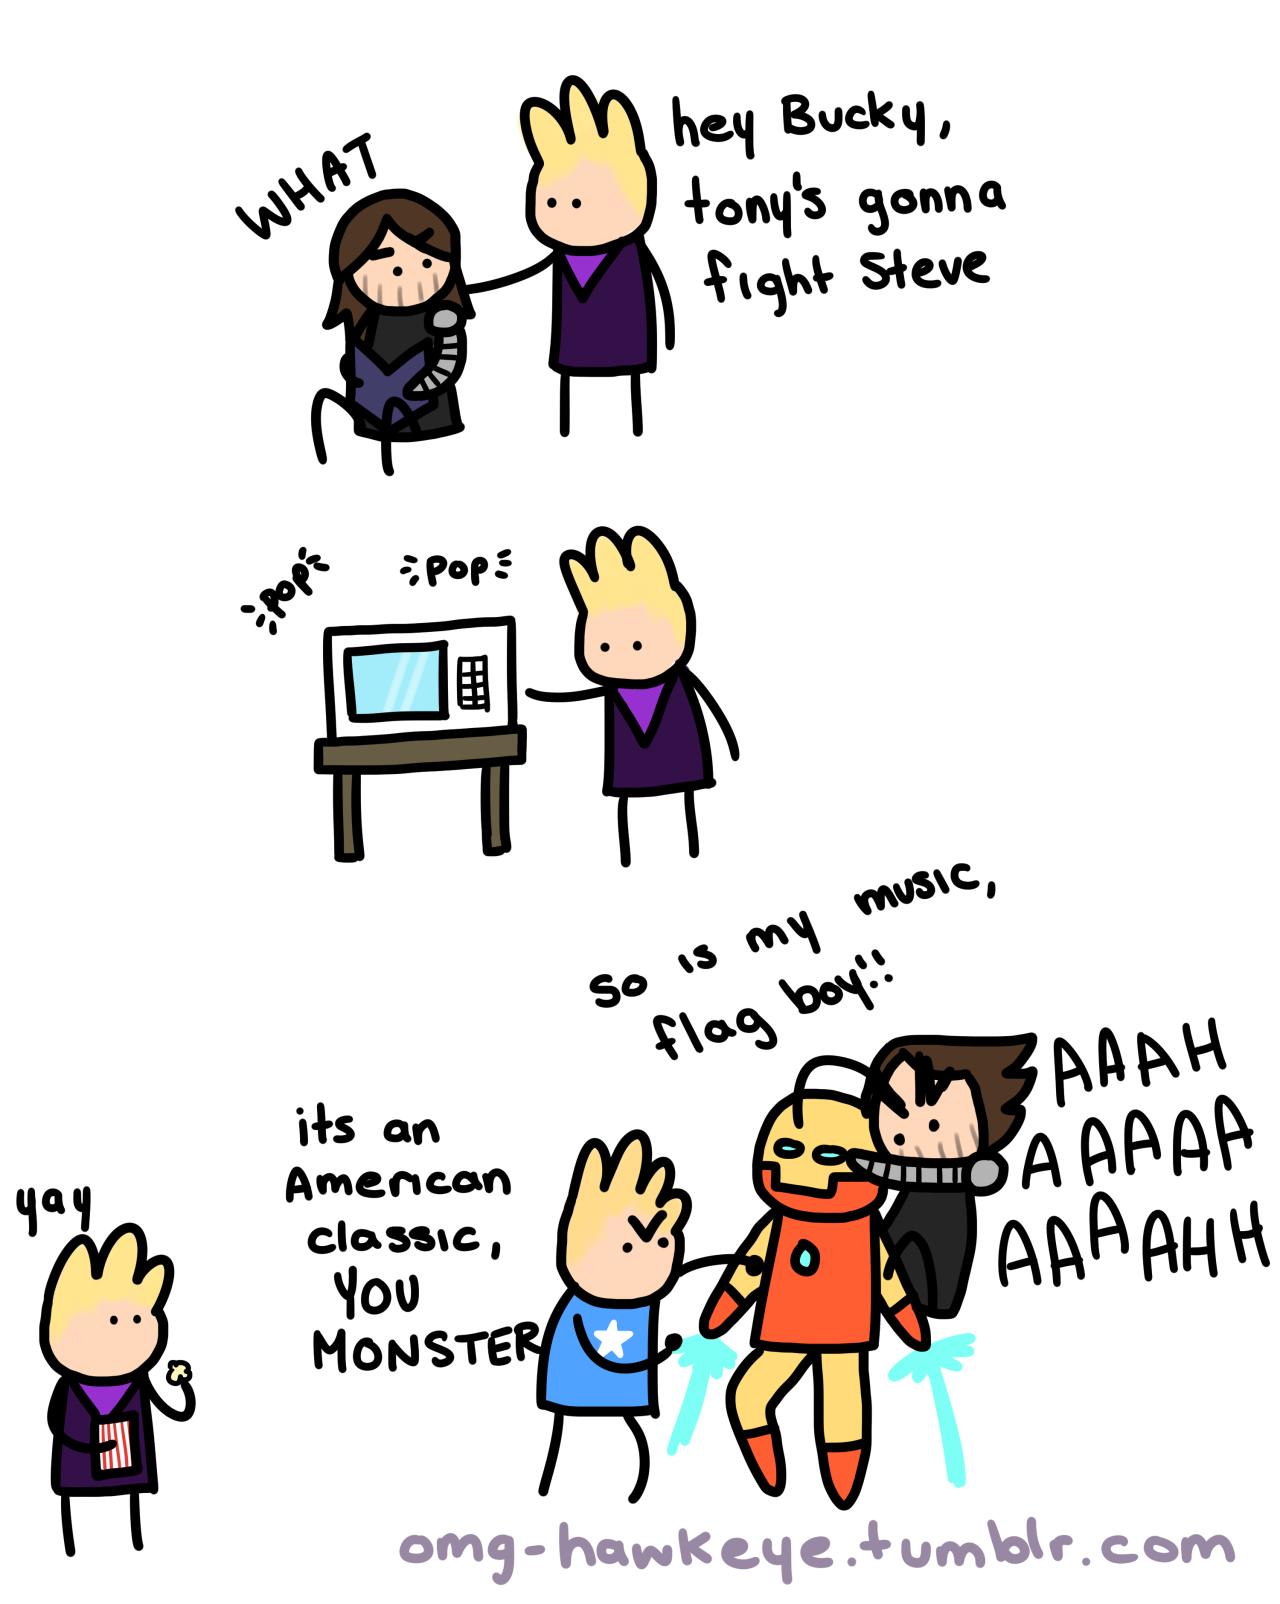 Funny Avengers Imagines